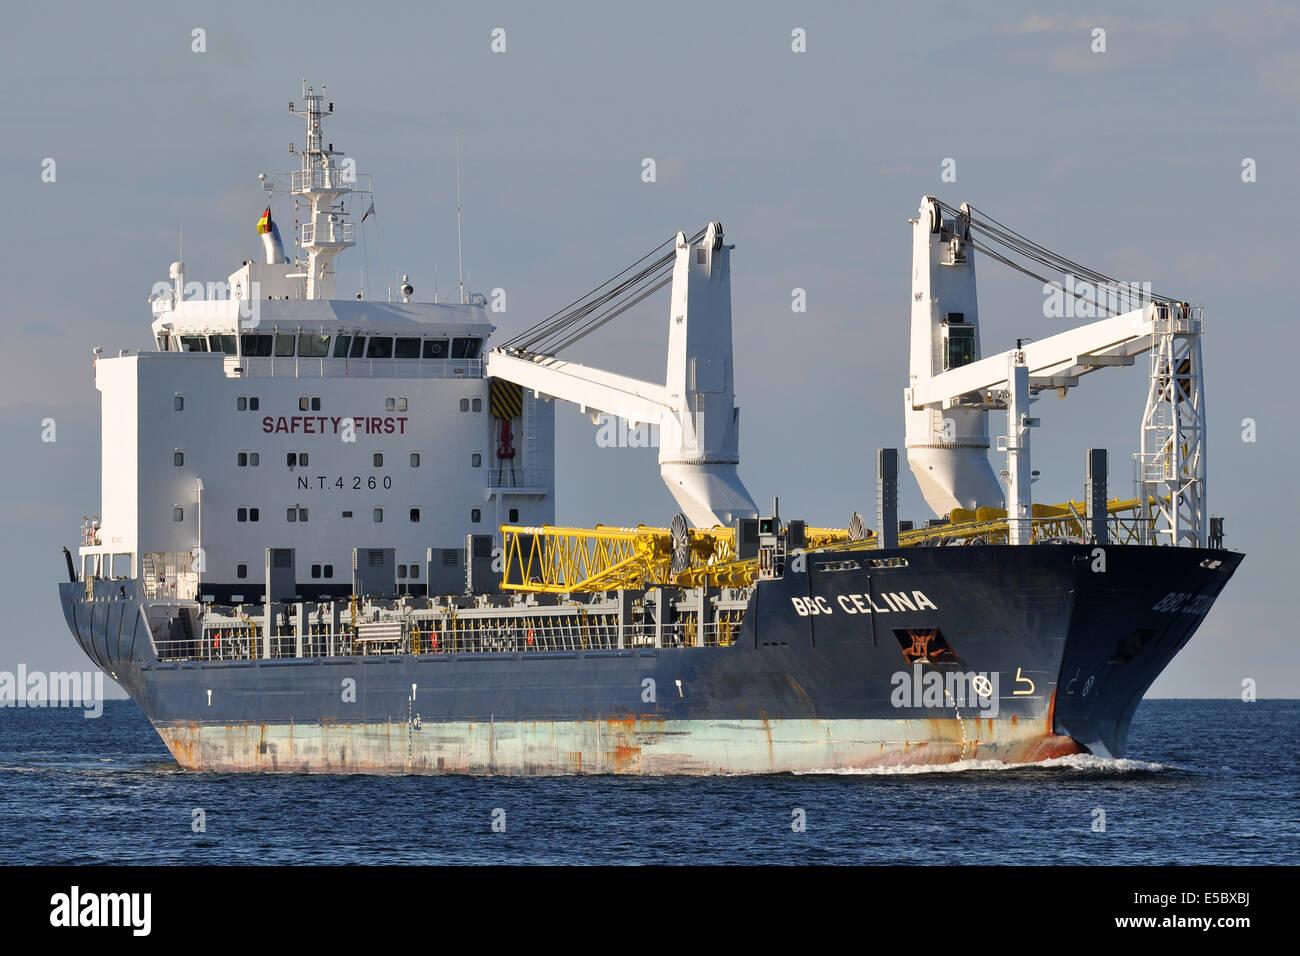 General cargo vessel BBC Celina inbound Kiel Fjord - Stock Image